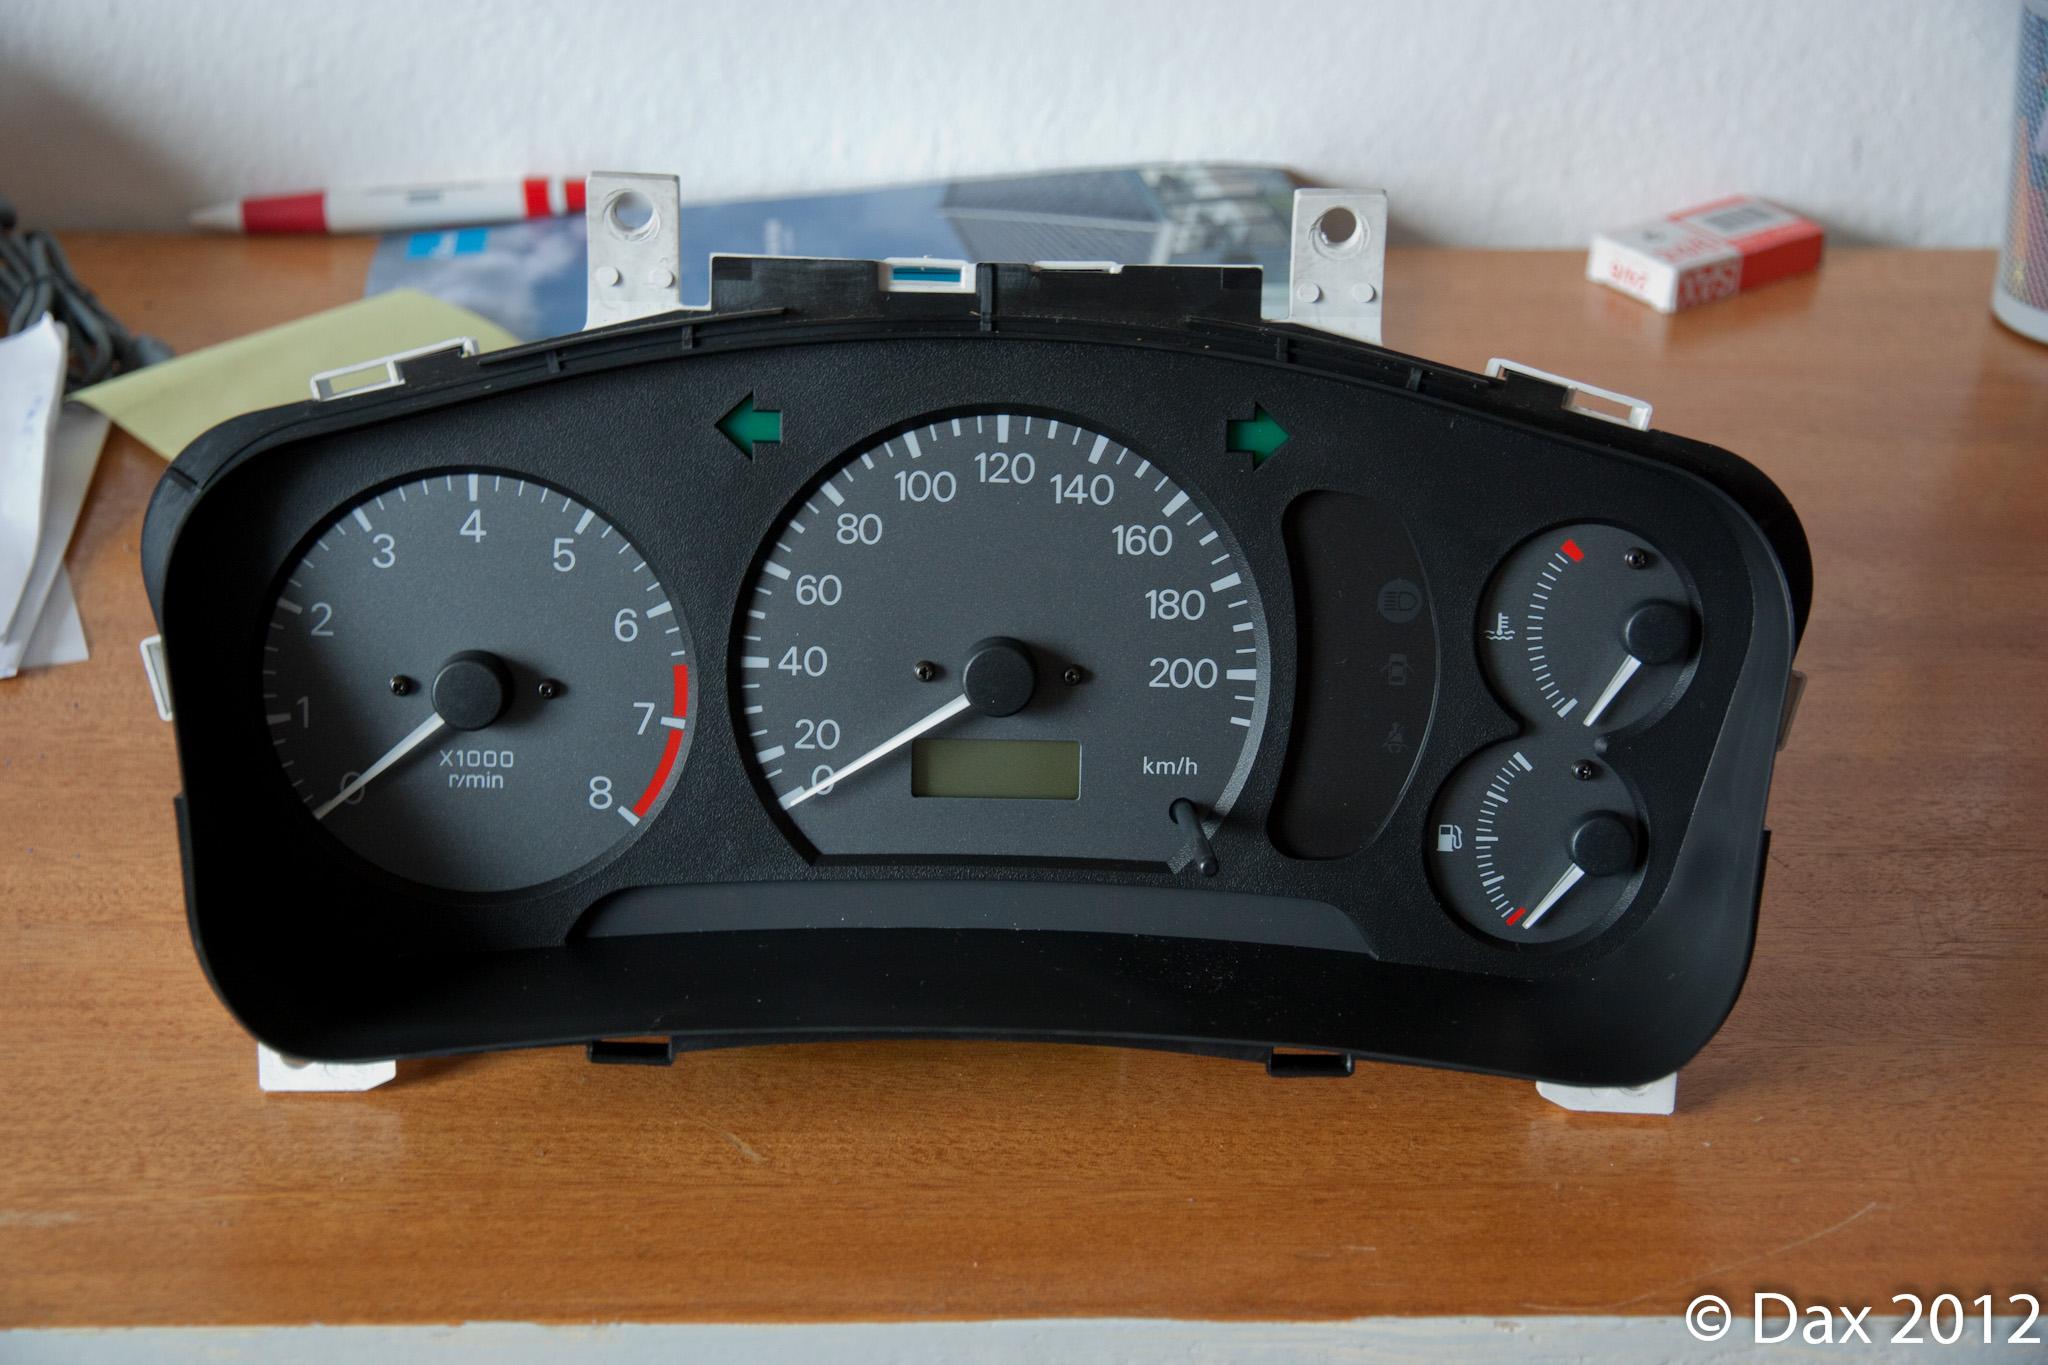 20120509-Dax-004